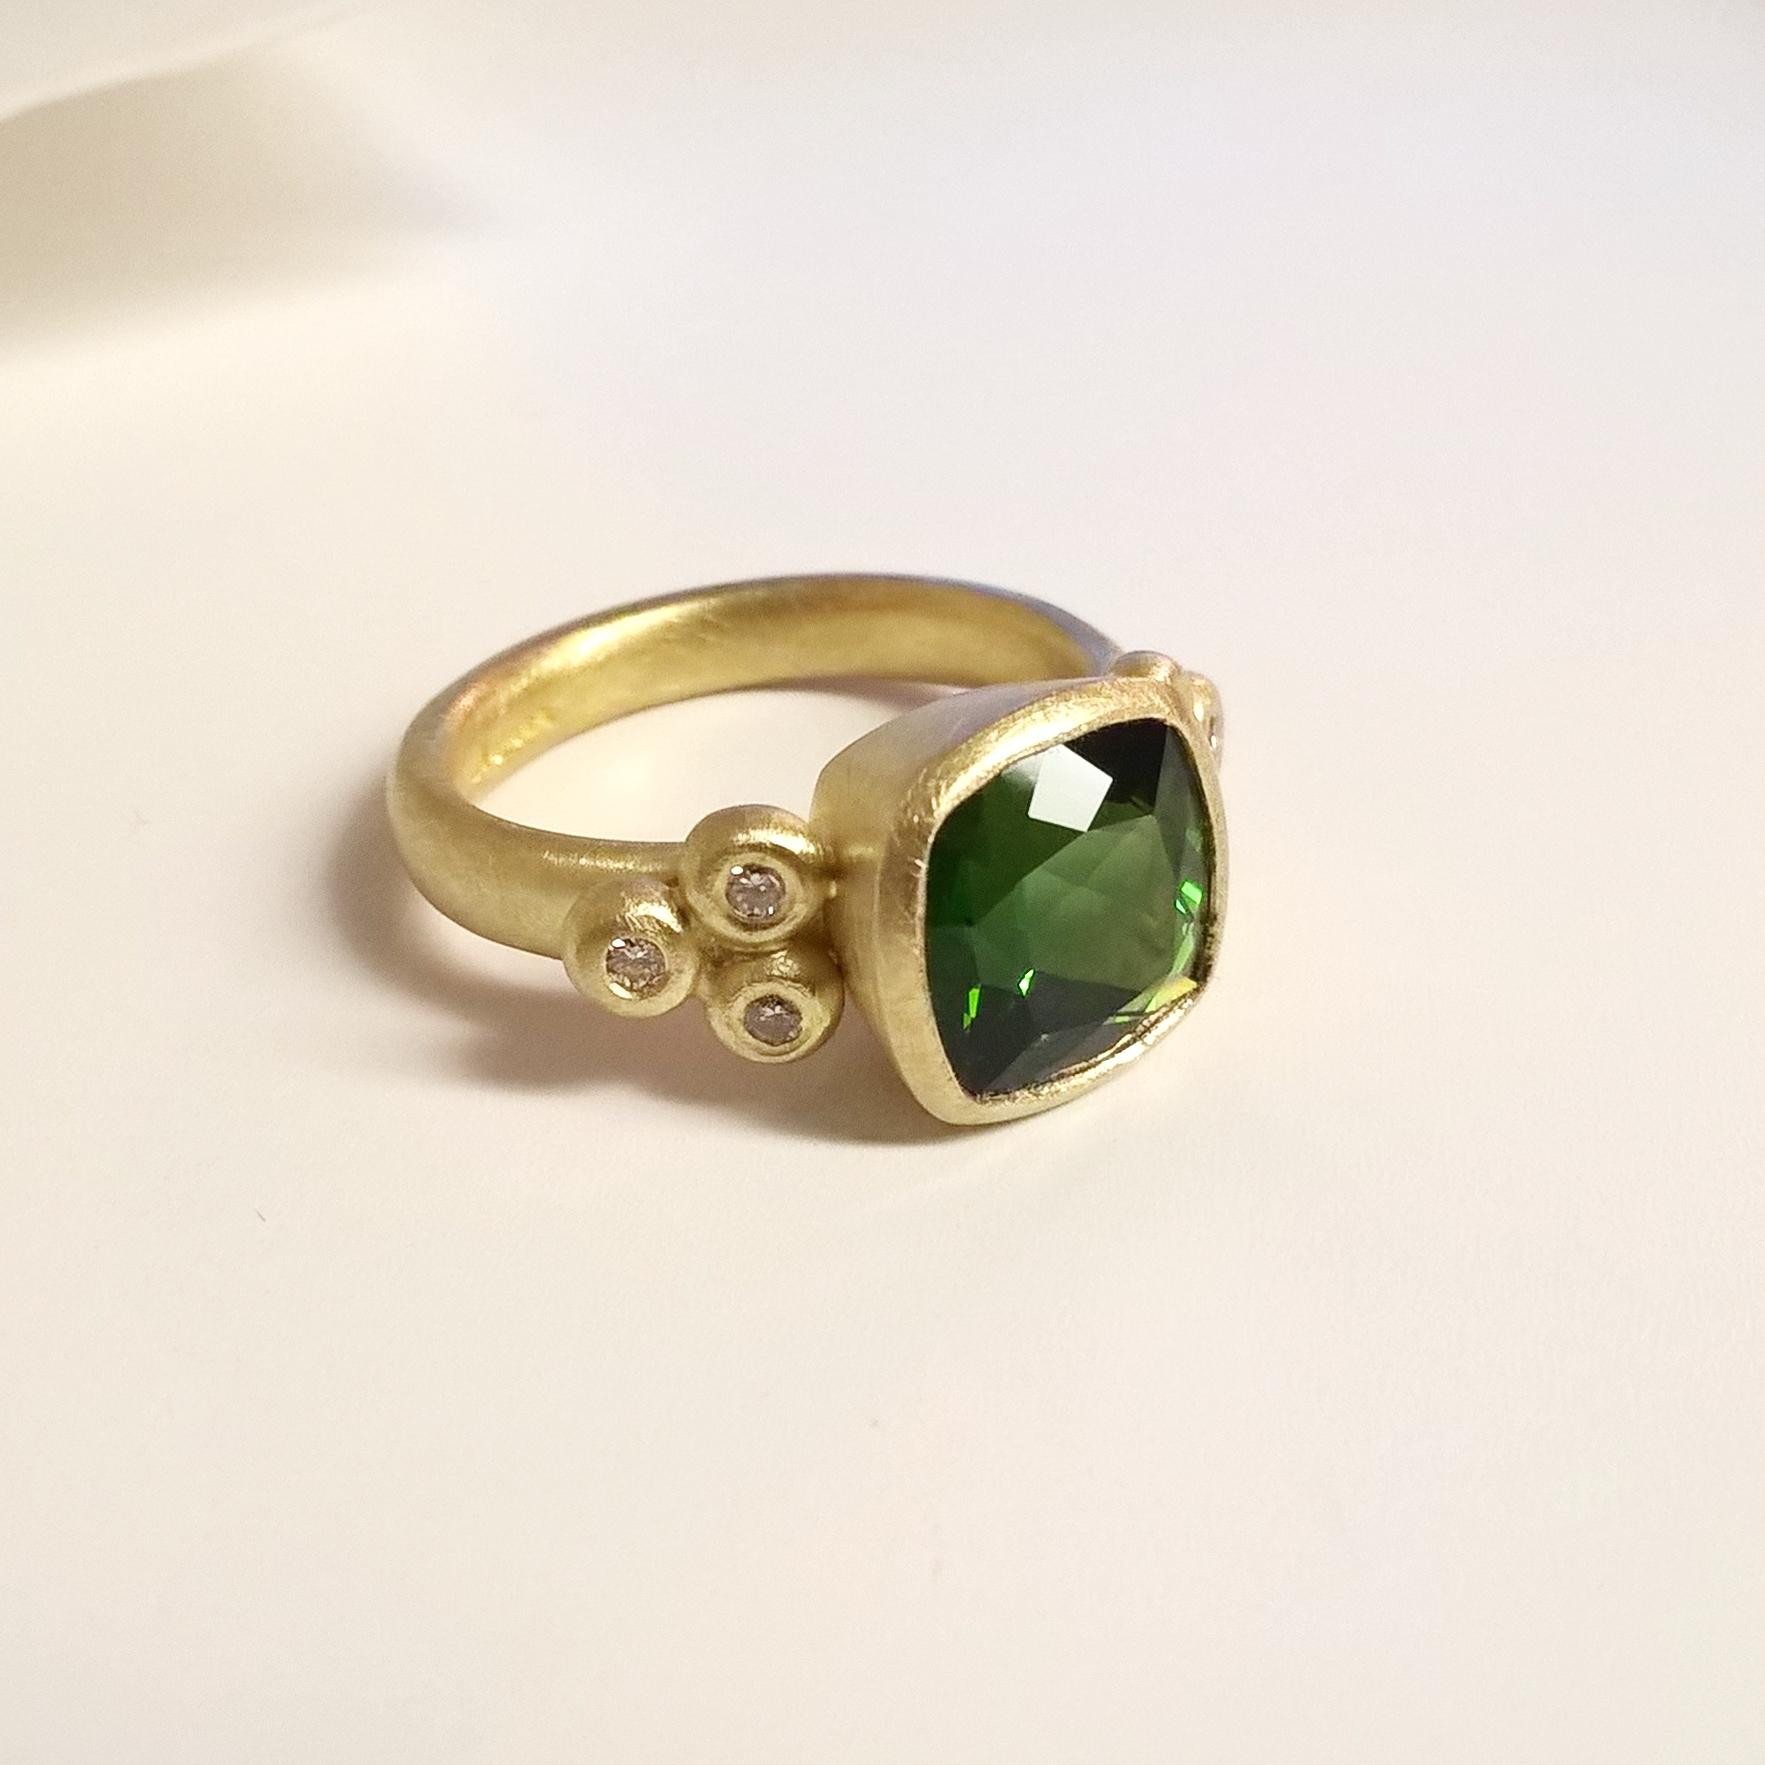 natalie harris jane tourmaline ring stone finished.jpg